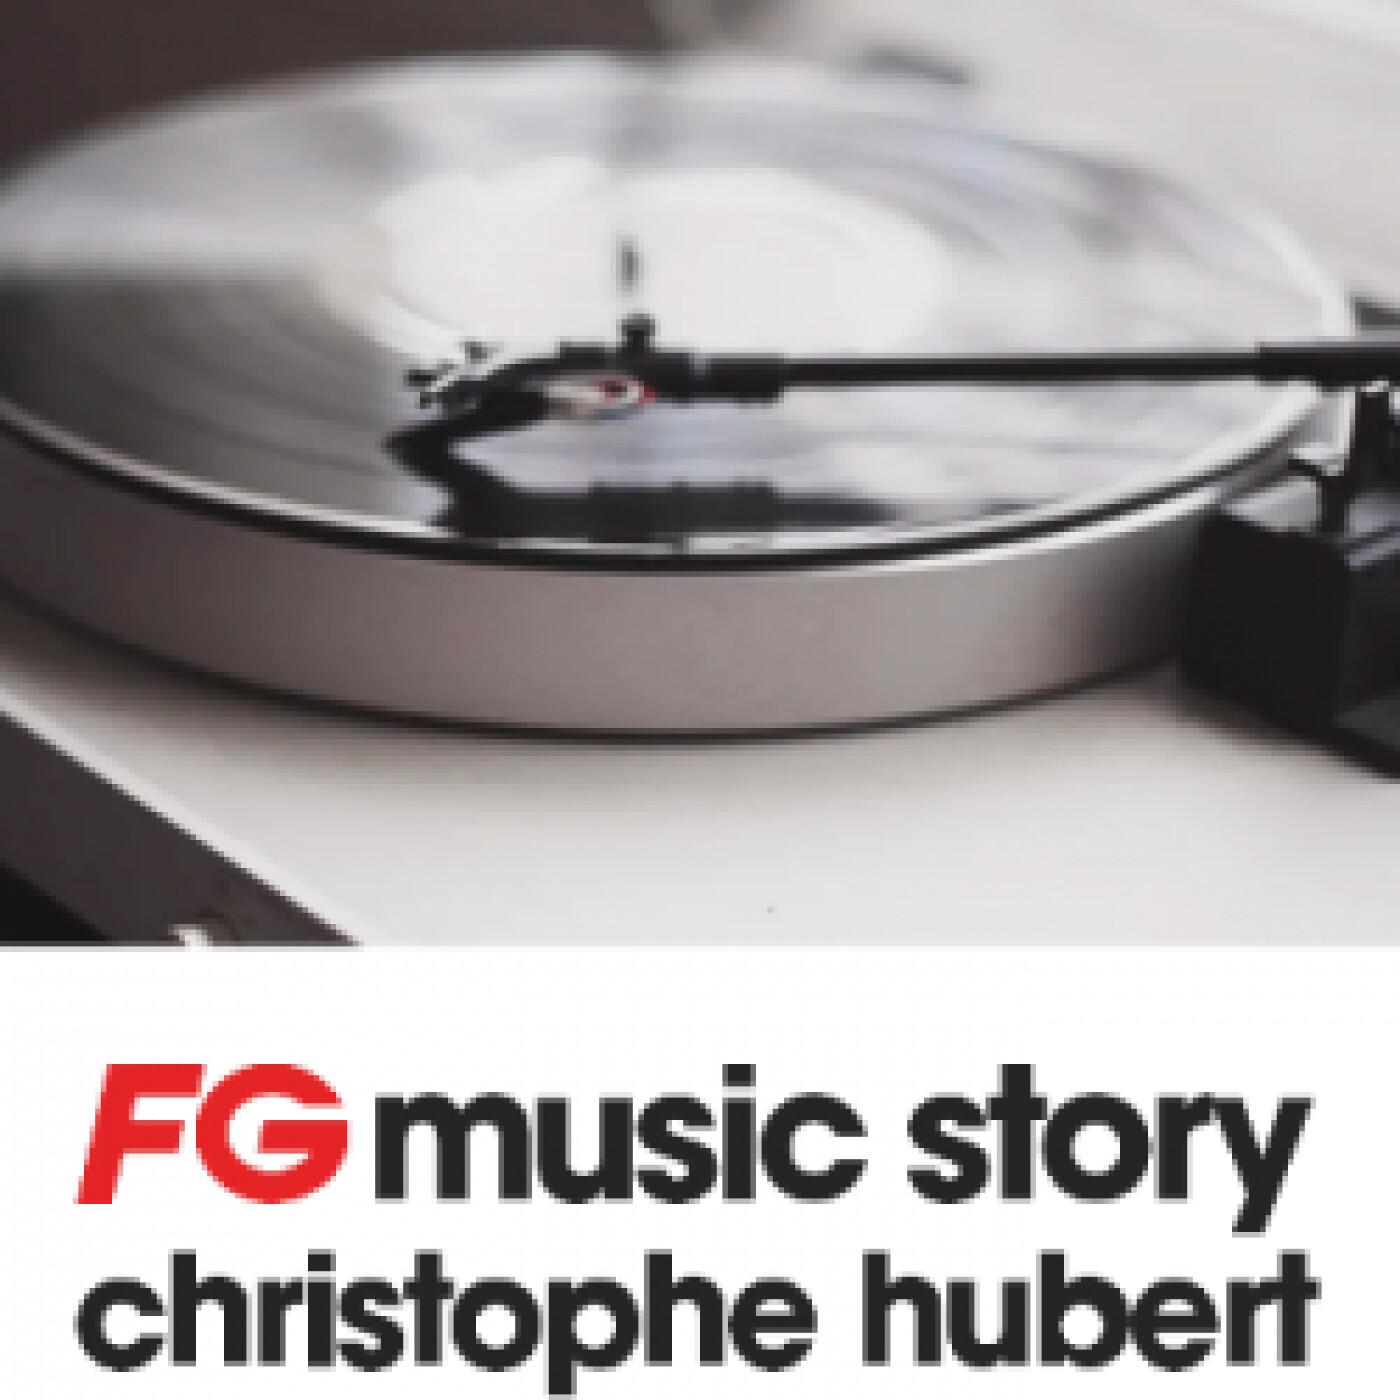 FG MUSIC STORY : KC LIGHTS